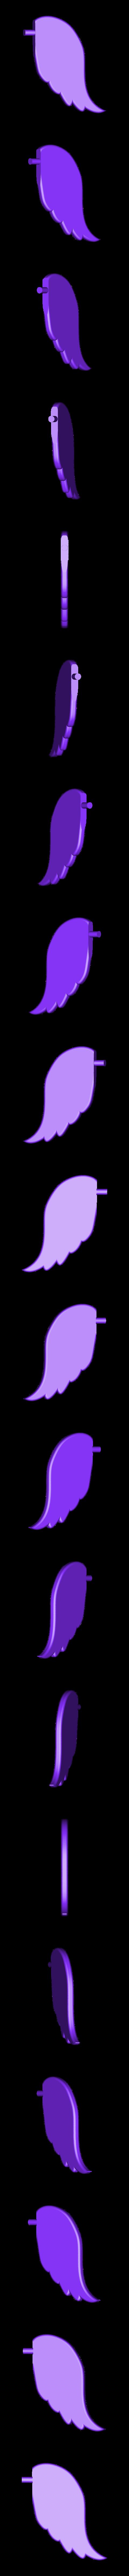 Wing.stl Download free STL file AngelBenchyTreeTopper • 3D printing model, Digitang3D